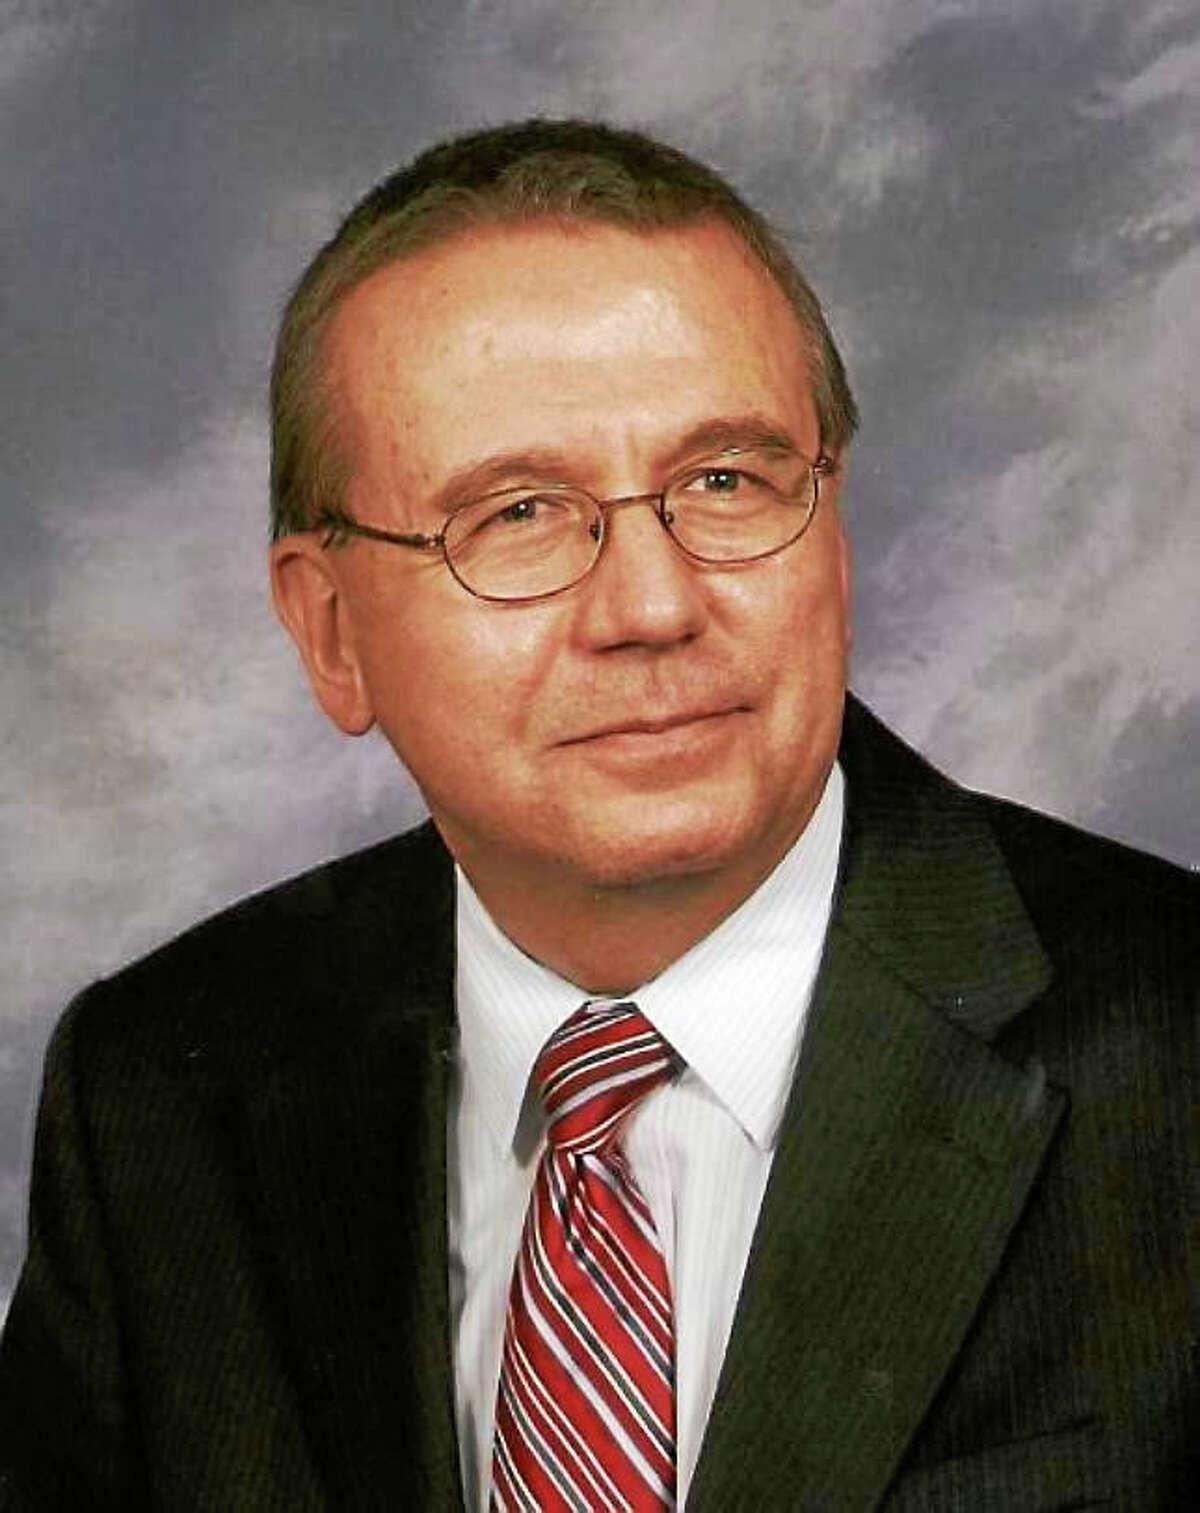 Deacon Dave Reynolds